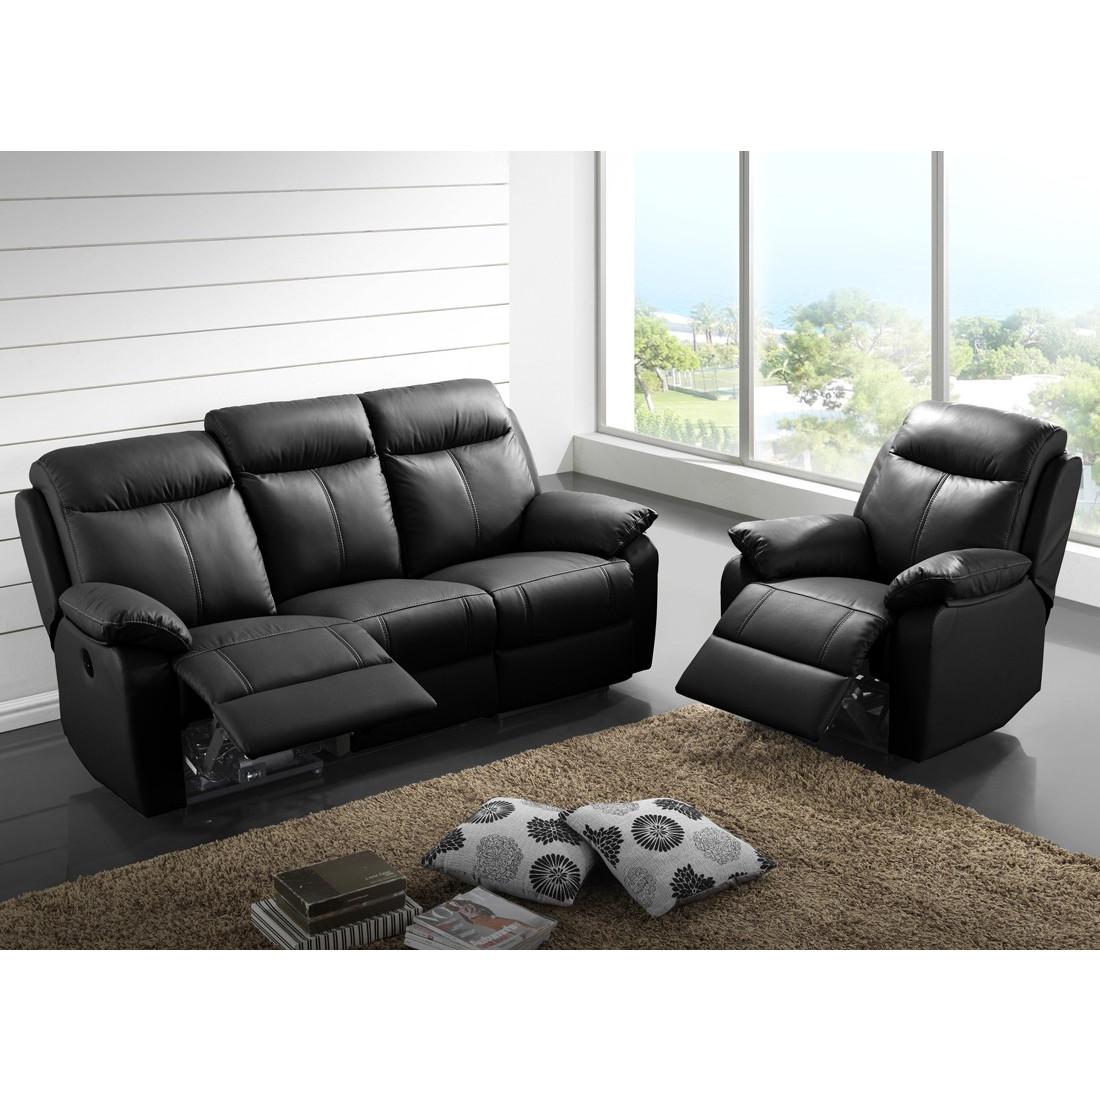 canap relax lectrique 3 places fauteuil relax. Black Bedroom Furniture Sets. Home Design Ideas